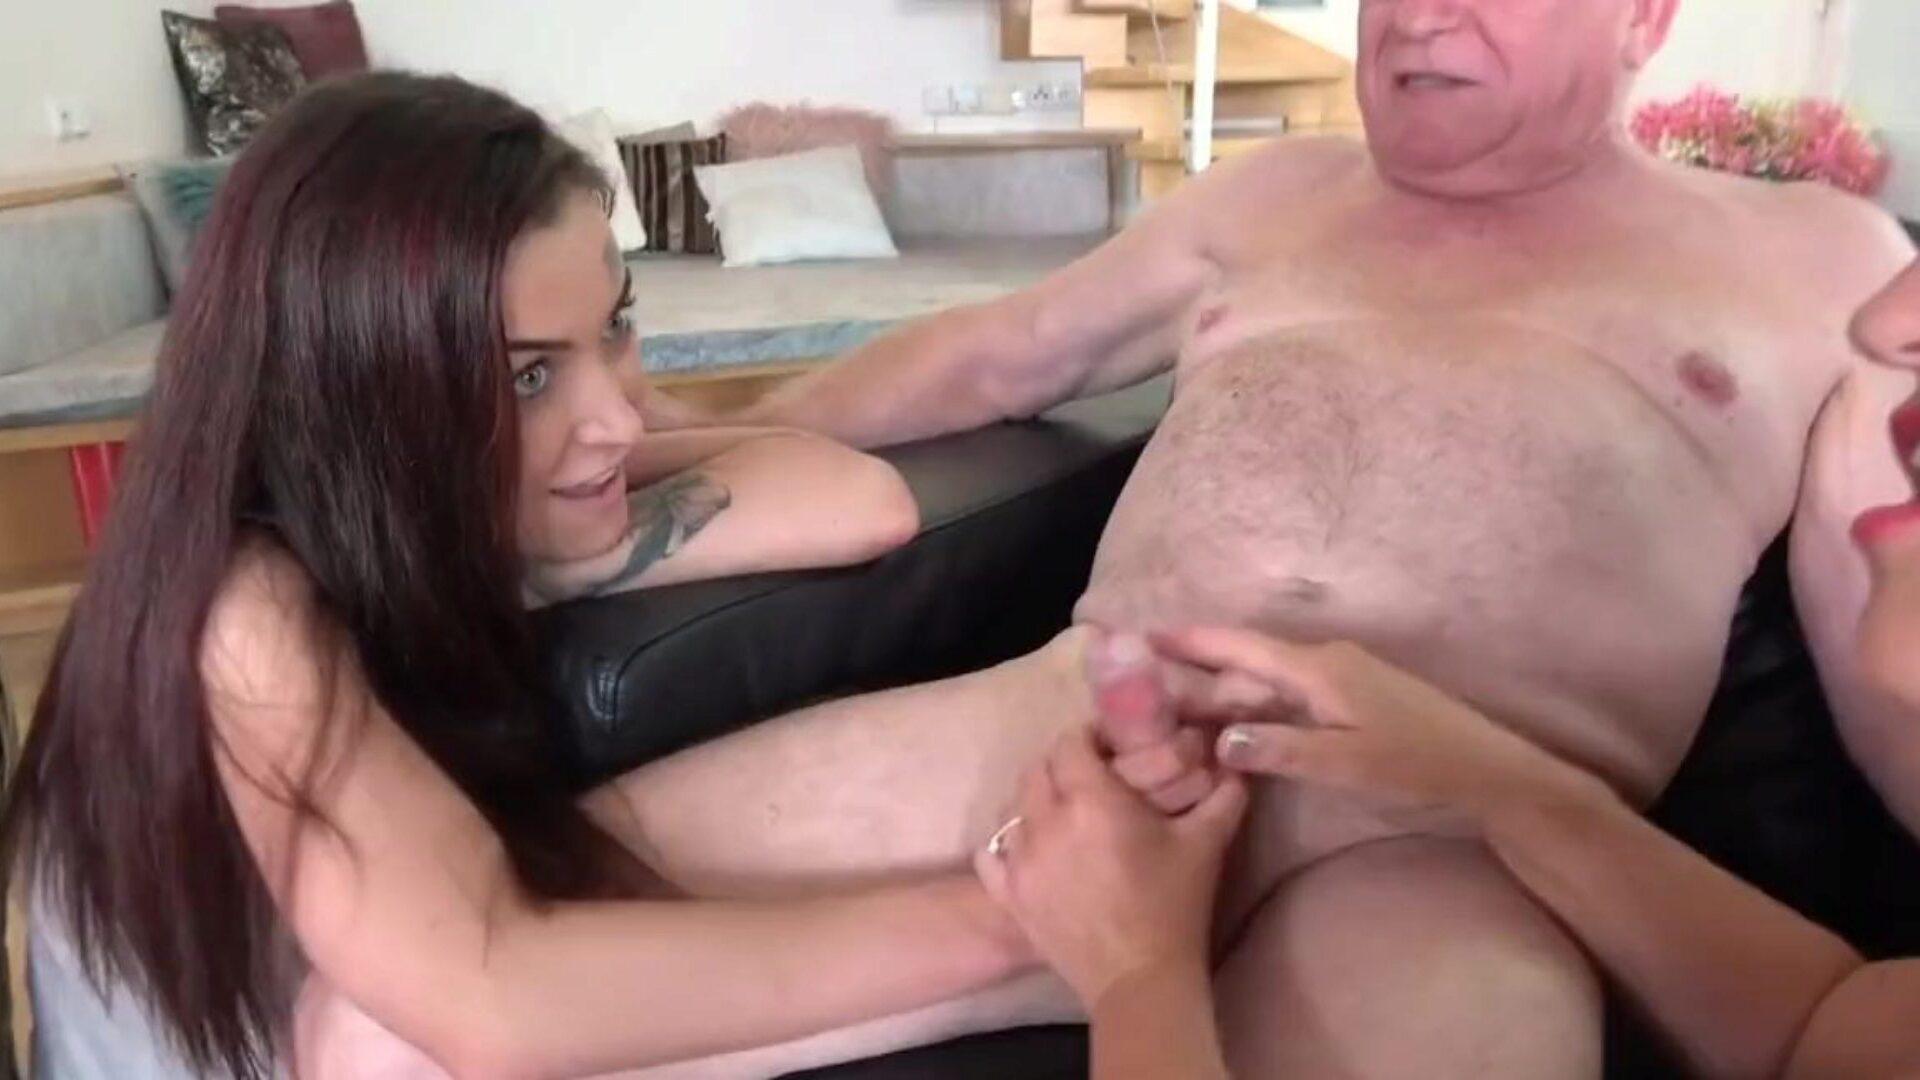 Hd pornofilme free